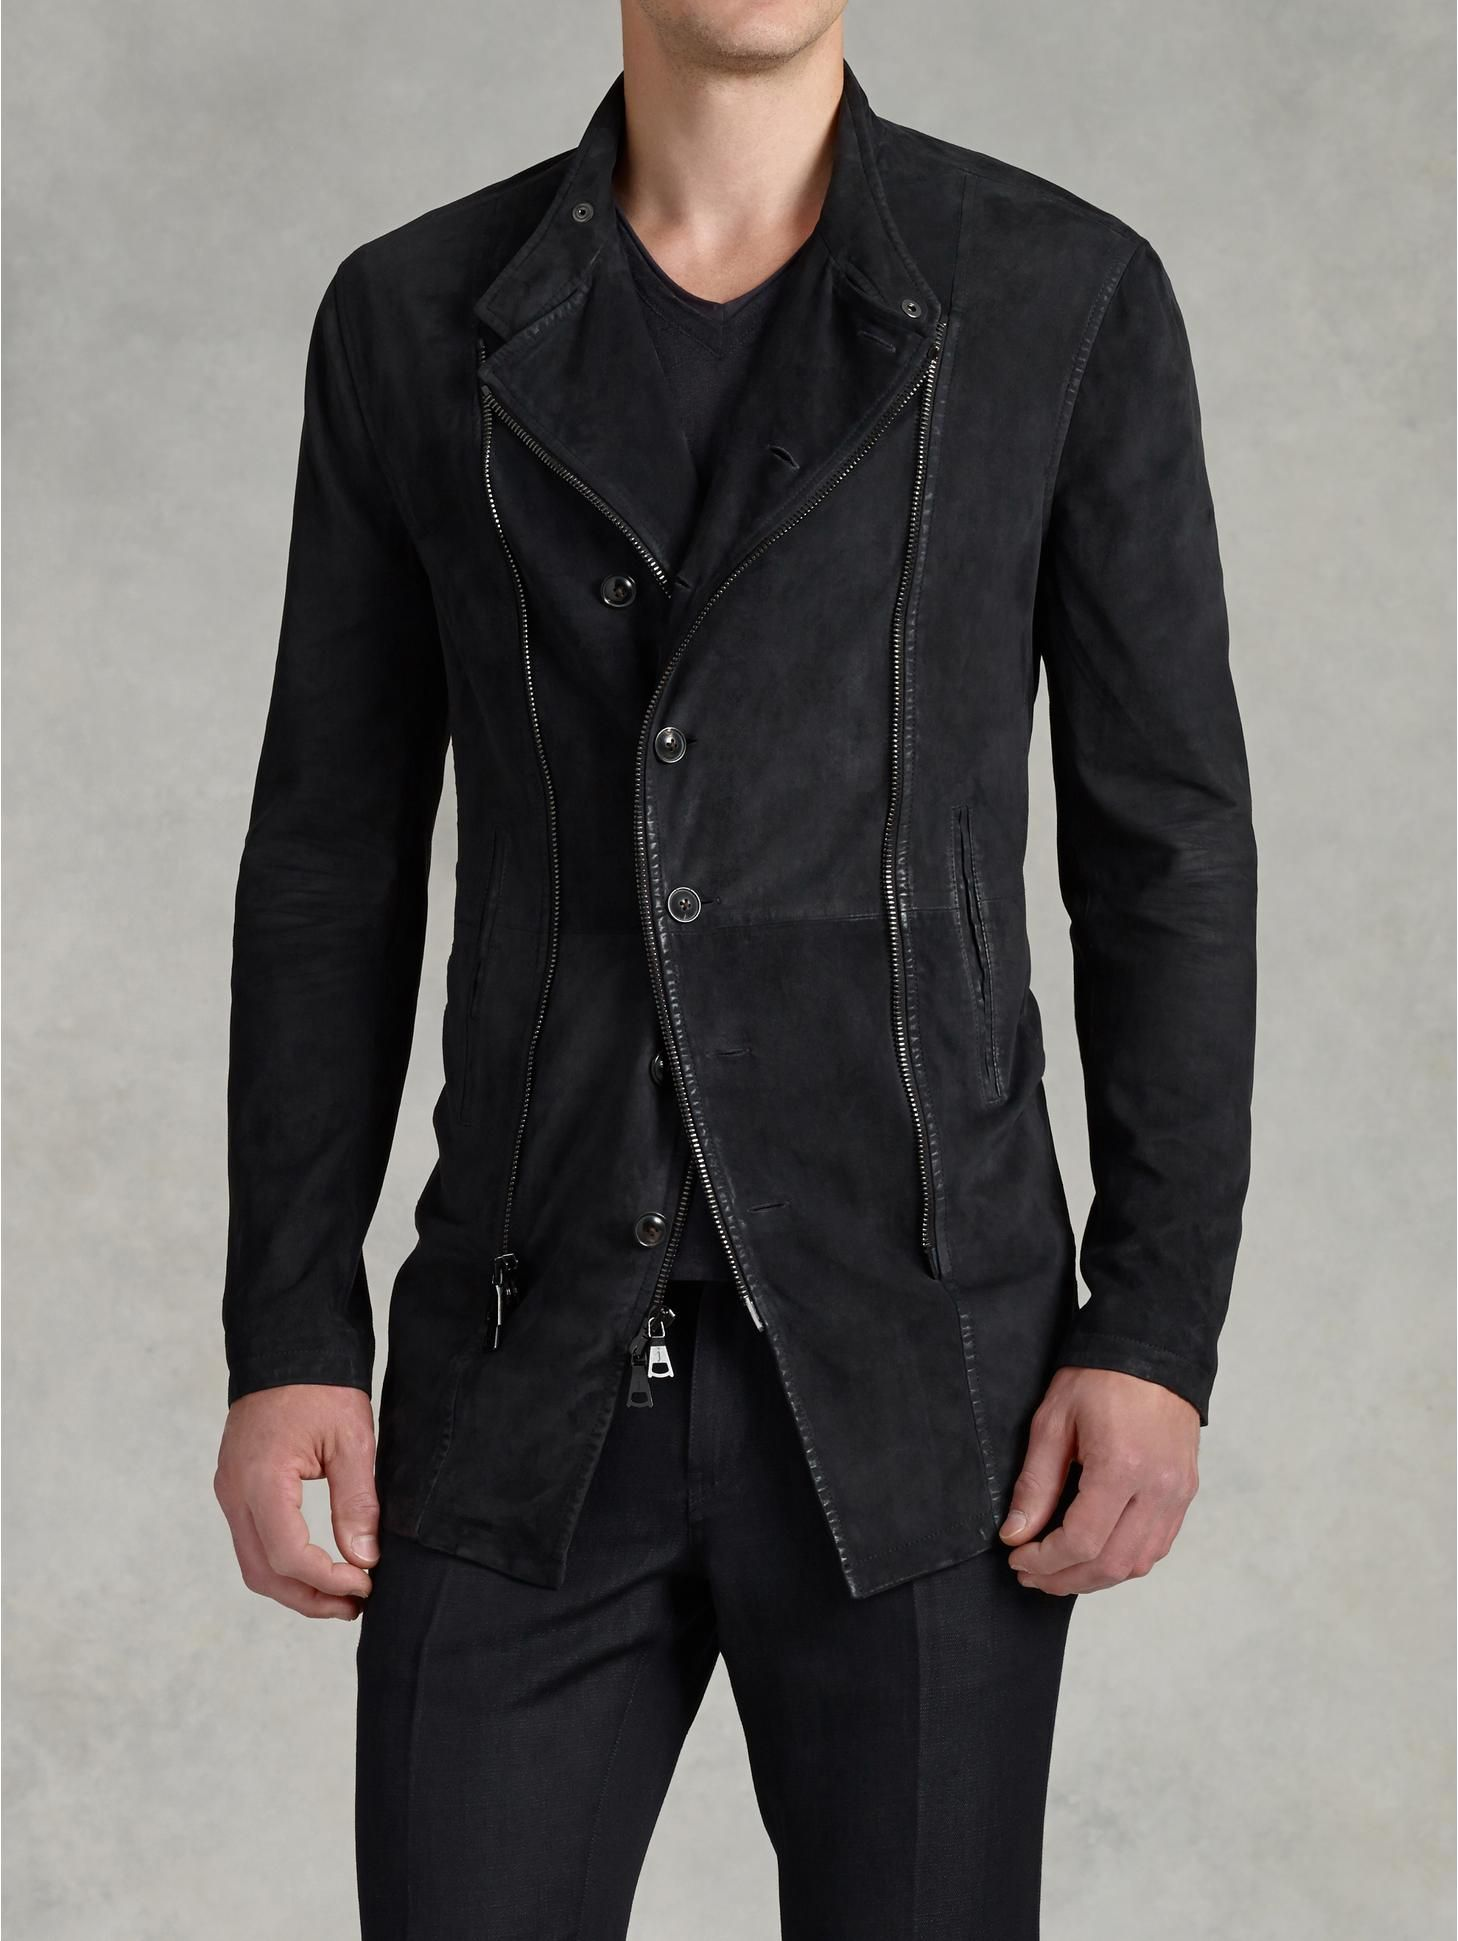 ee5f8583e438 Asymmetrical Zip and Button Front Jacket - John Varvatos | John ...